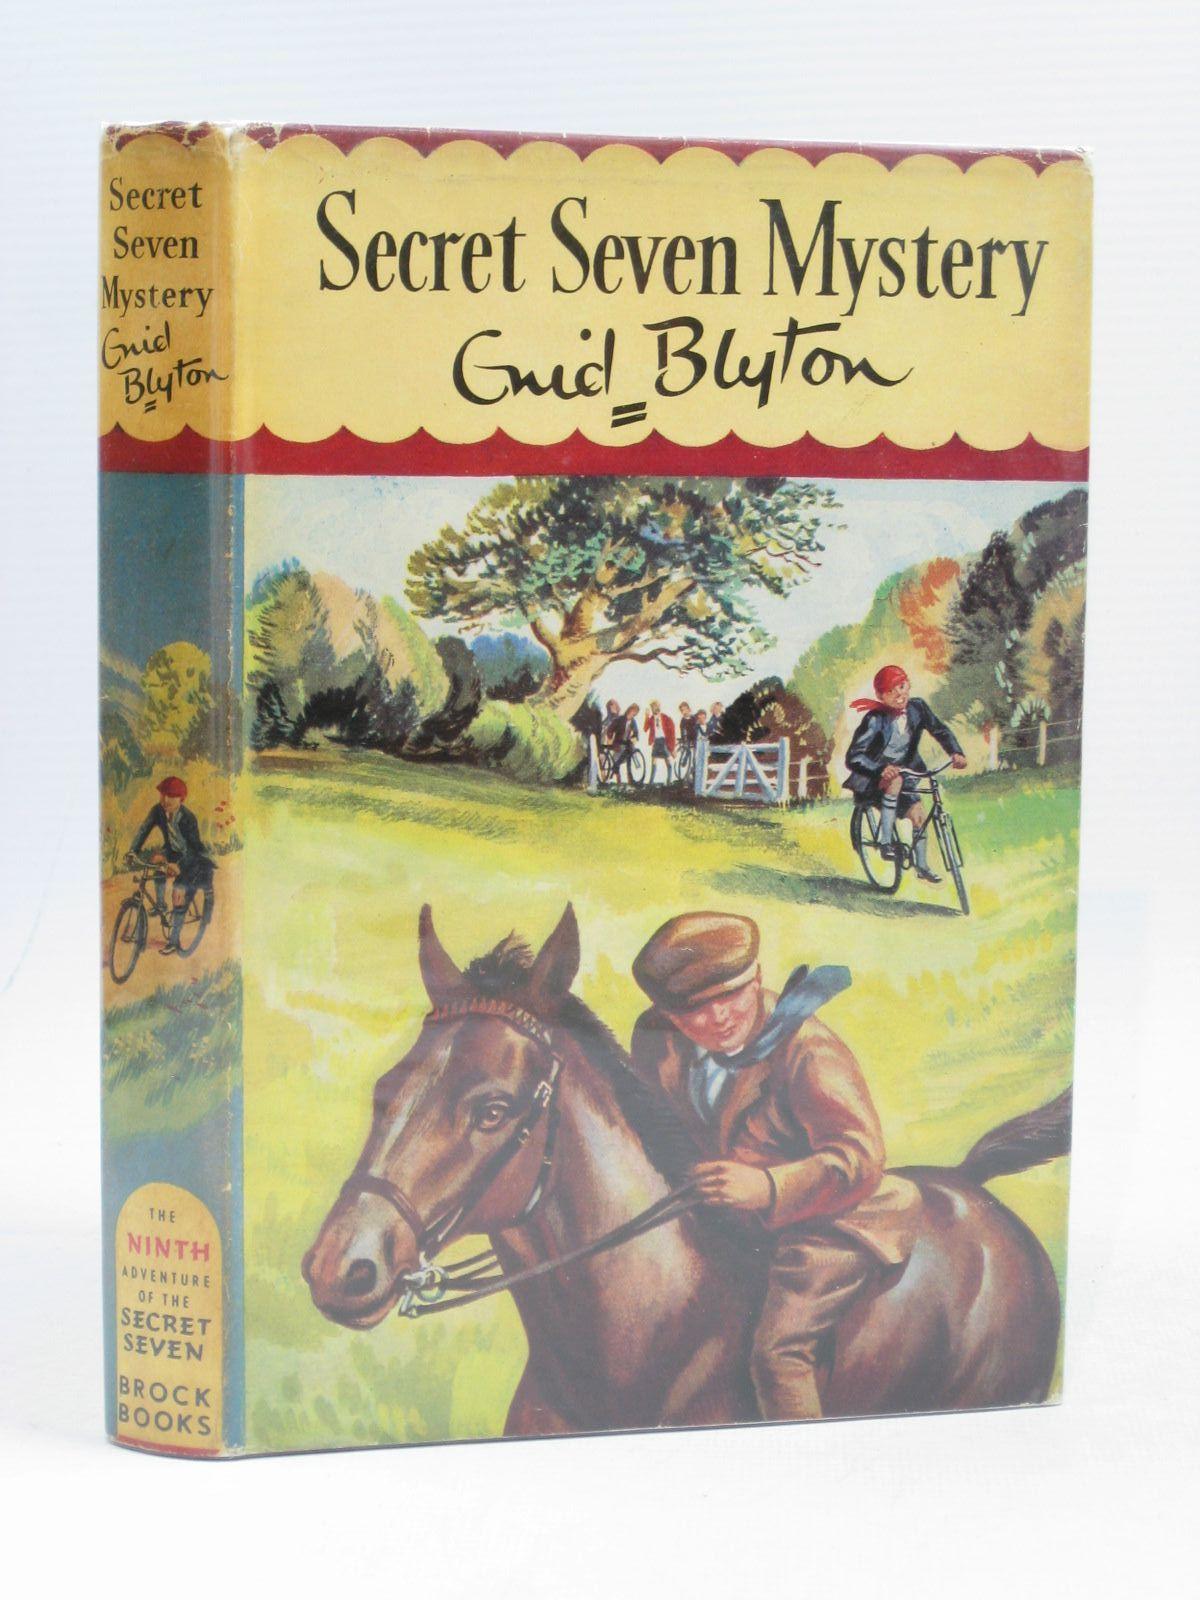 Cover of SECRET SEVEN MYSTERY by Enid Blyton